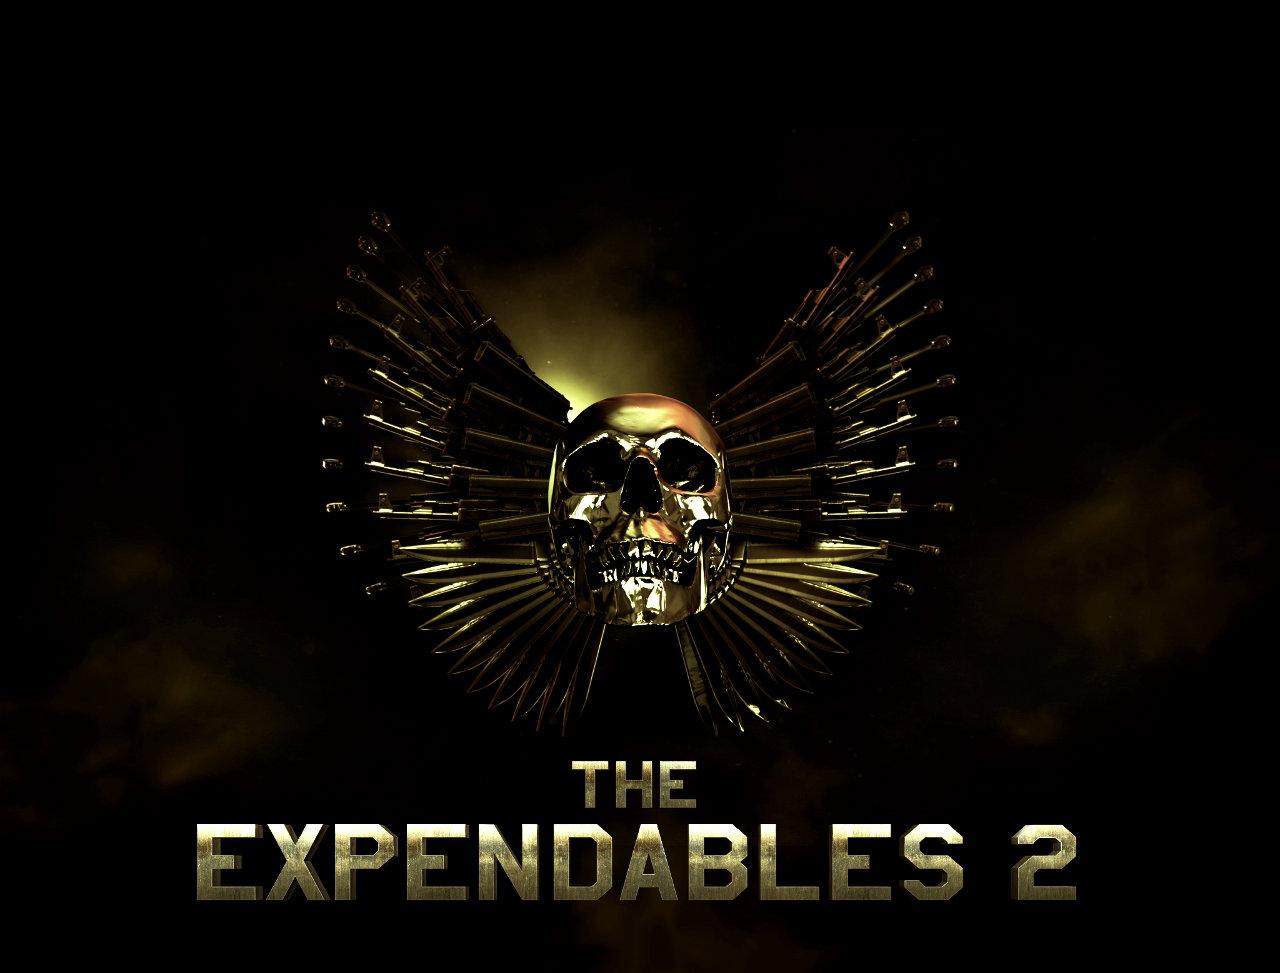 http://1.bp.blogspot.com/-Agk92pN896I/TvXEmSZzaiI/AAAAAAAAB9c/3EUgm9471IU/s1600/The-Expendables-2-Wallpaper-01.jpg